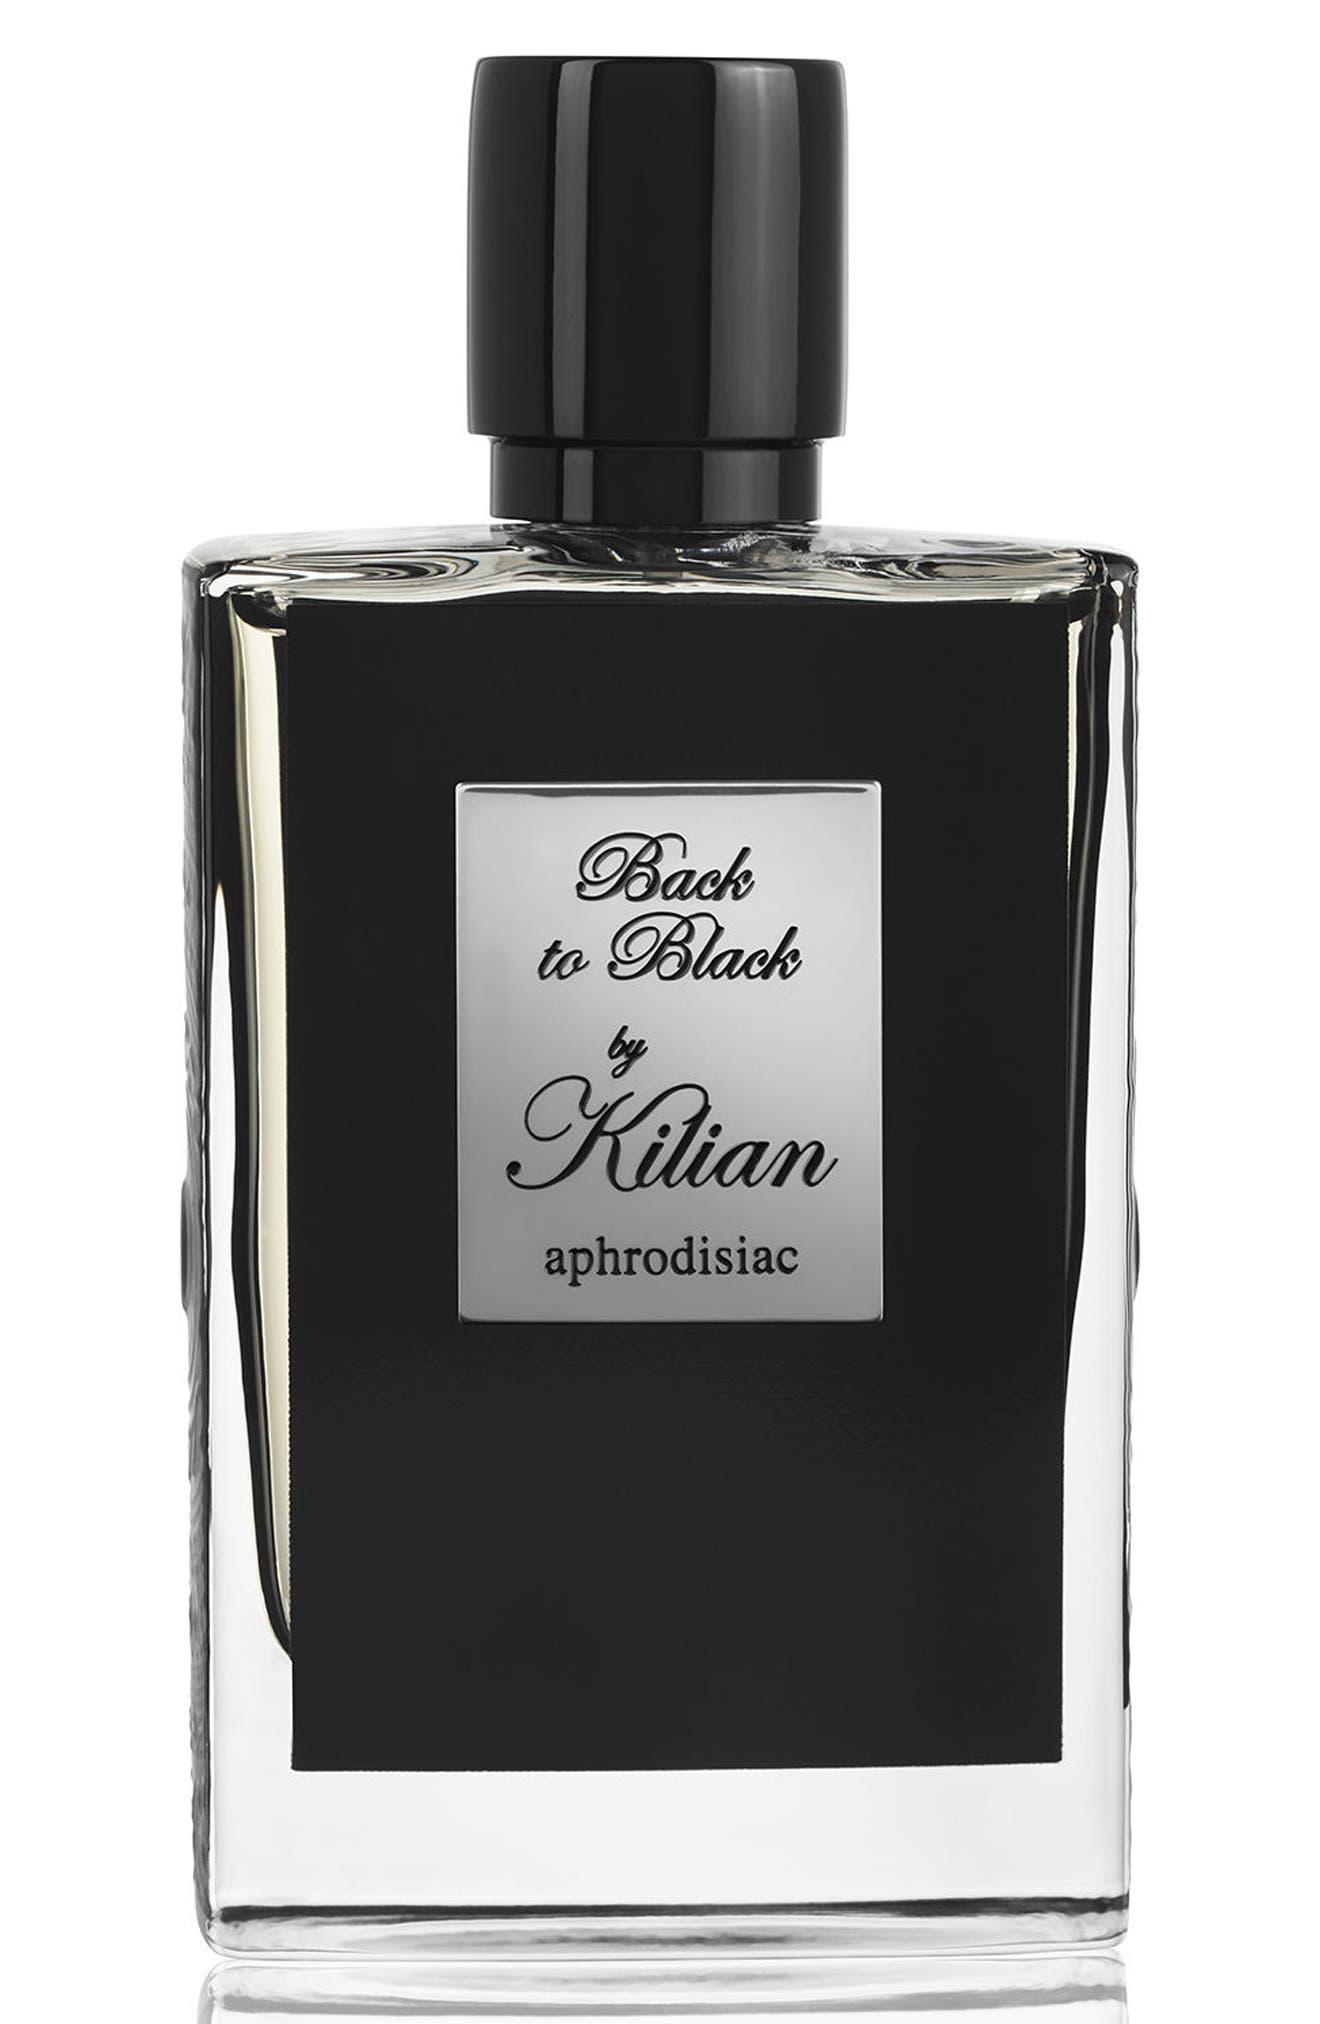 LOeuvre Noire - Back to Black, aphrodisiac Refillable Fragrance Spray,                         Main,                         color, NO COLOR